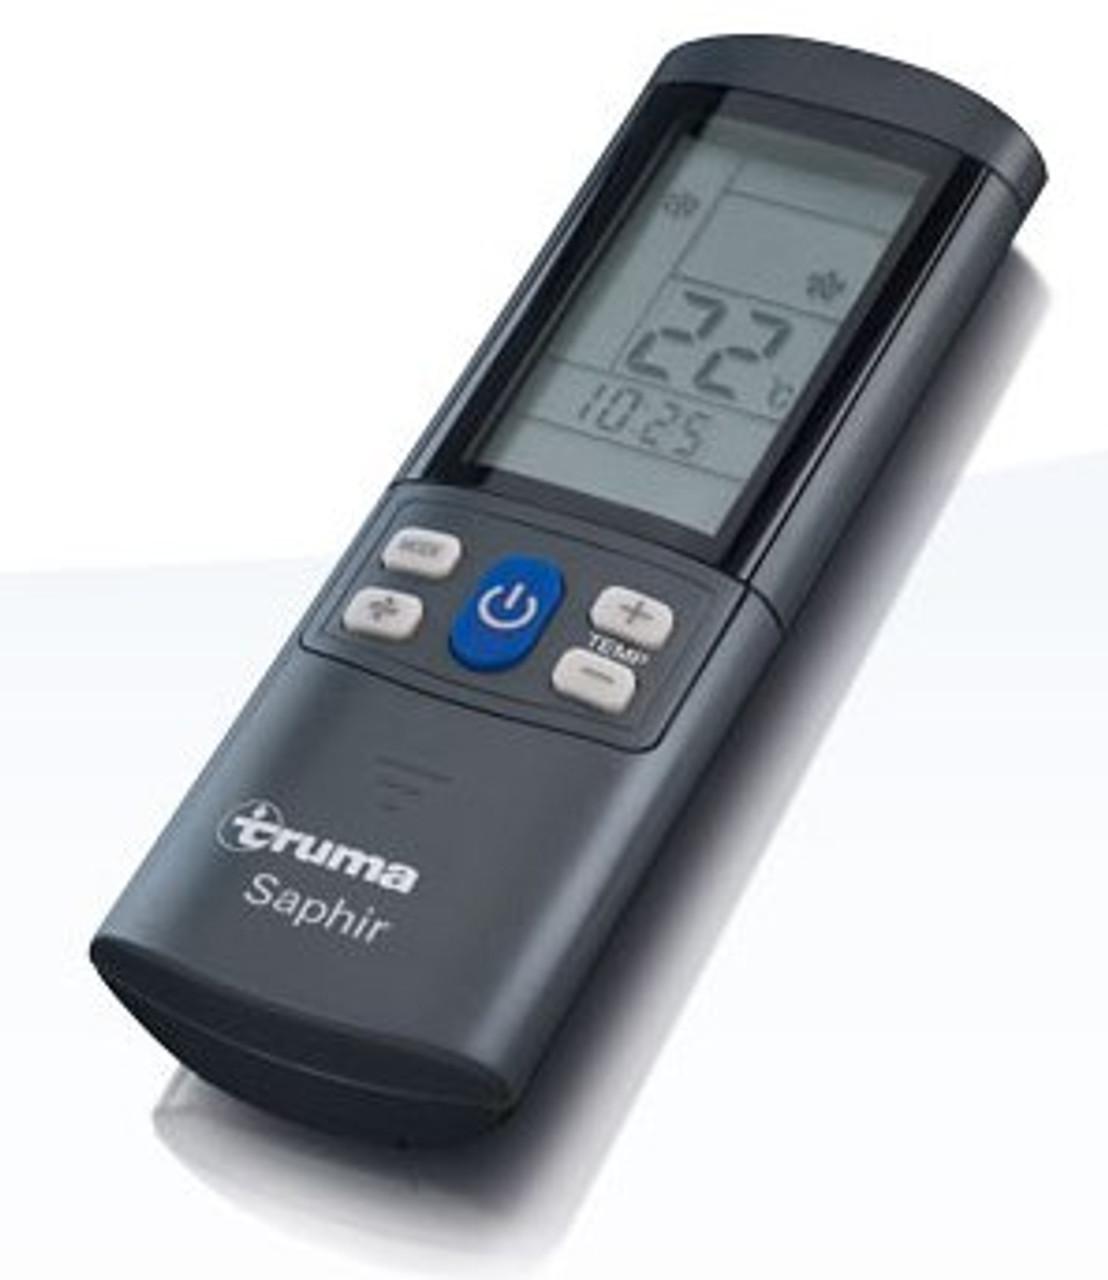 Truma Saphir Comfort digital remote control.